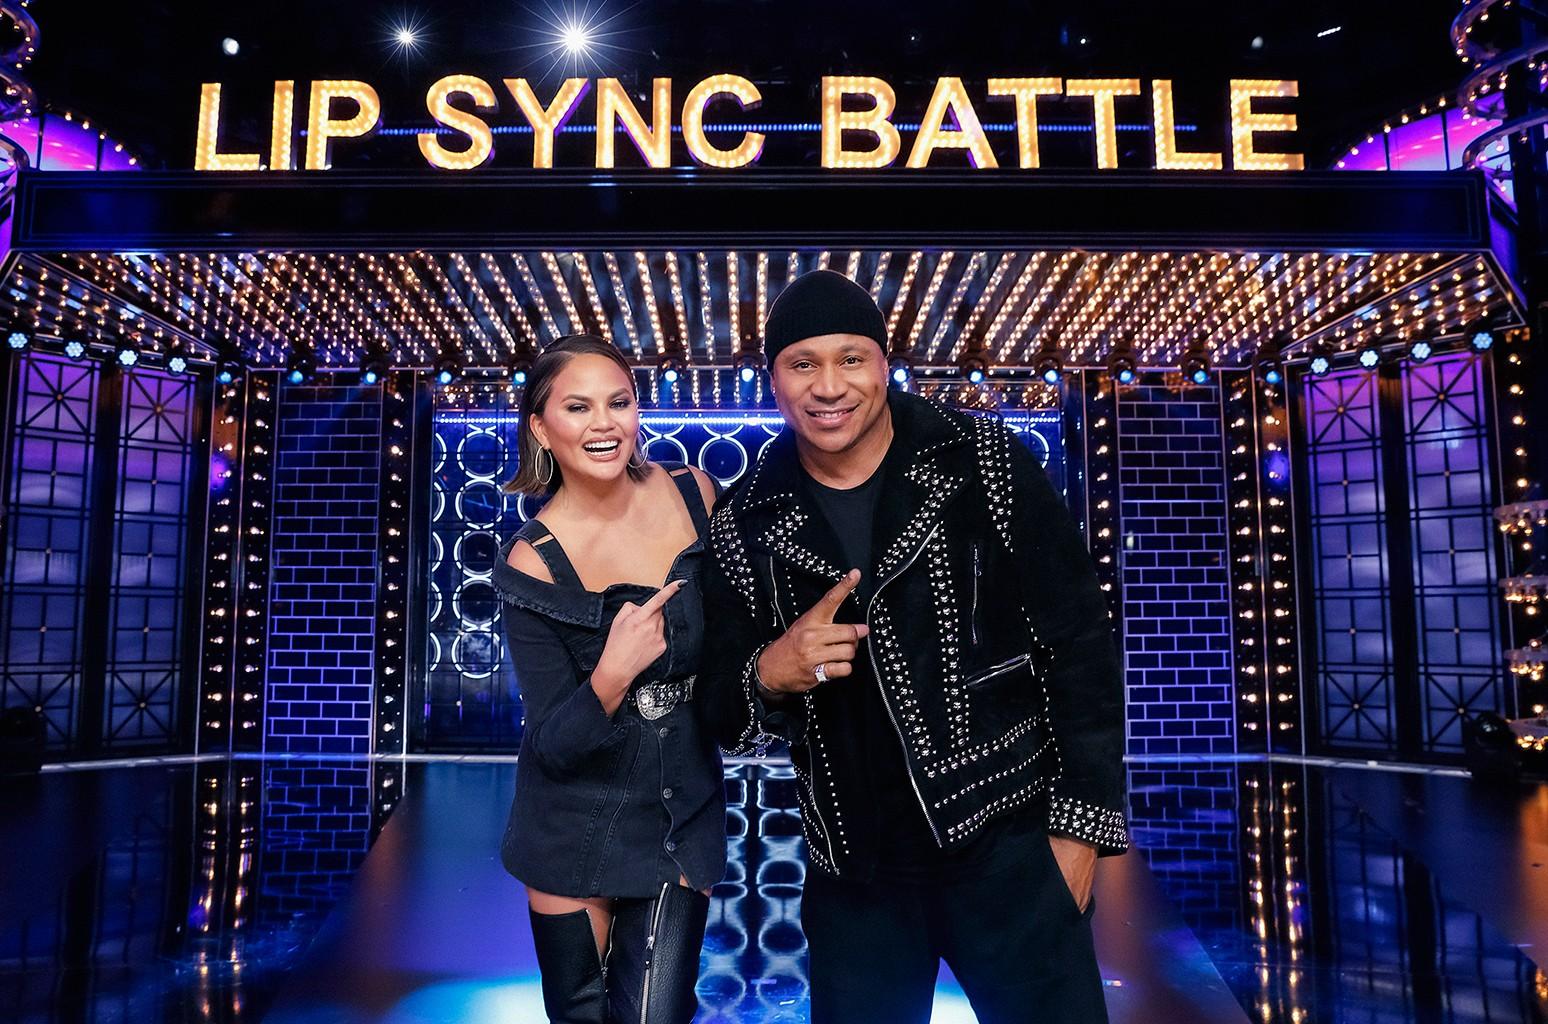 Chrissy Teigen & LL Cool J